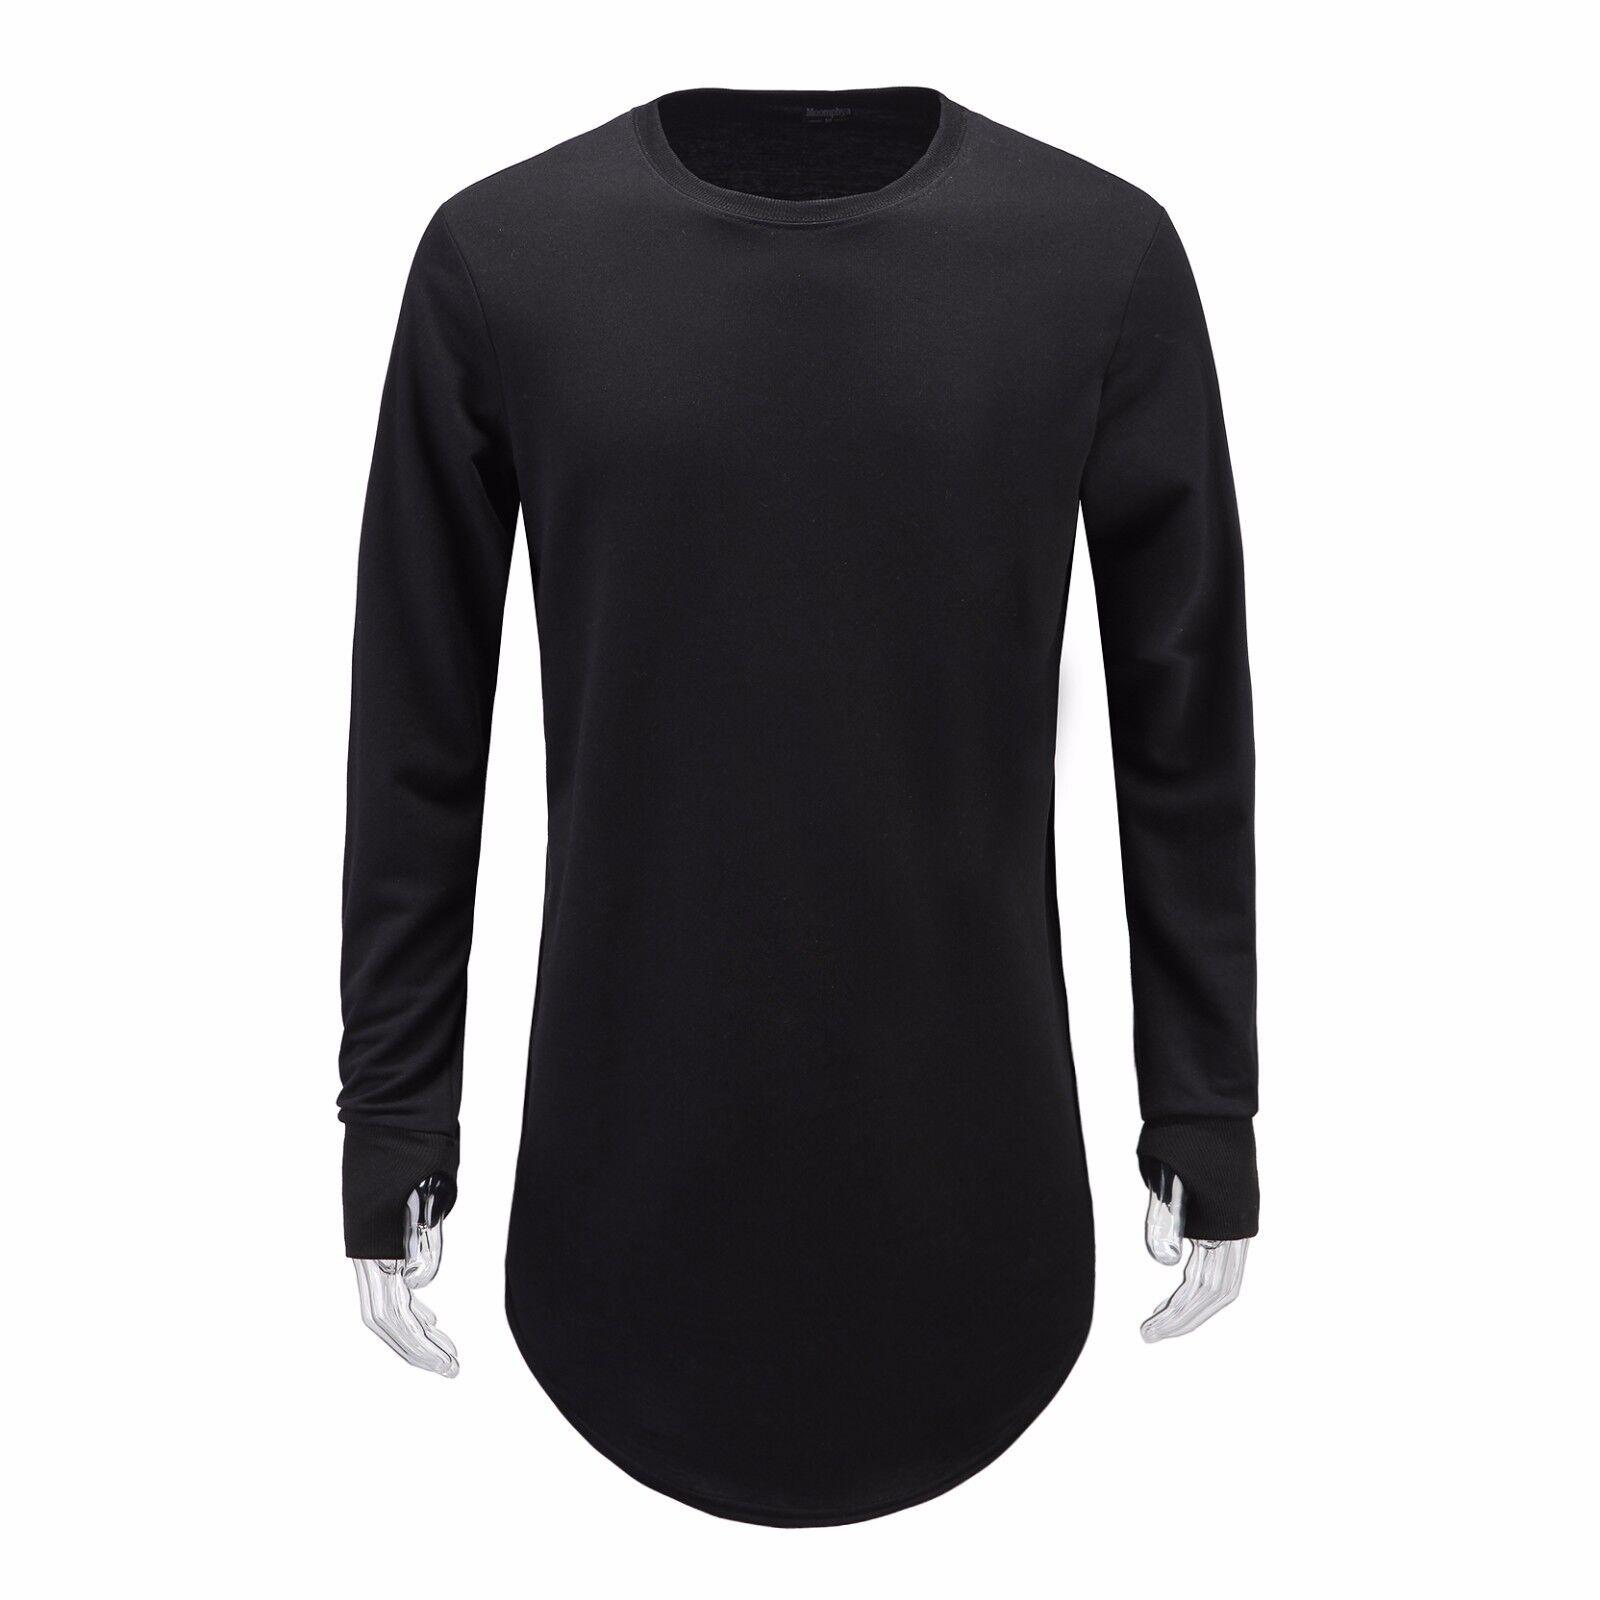 Hipster Mens Thumb Hole Cuffs Long Sleeve T Shirt Basic